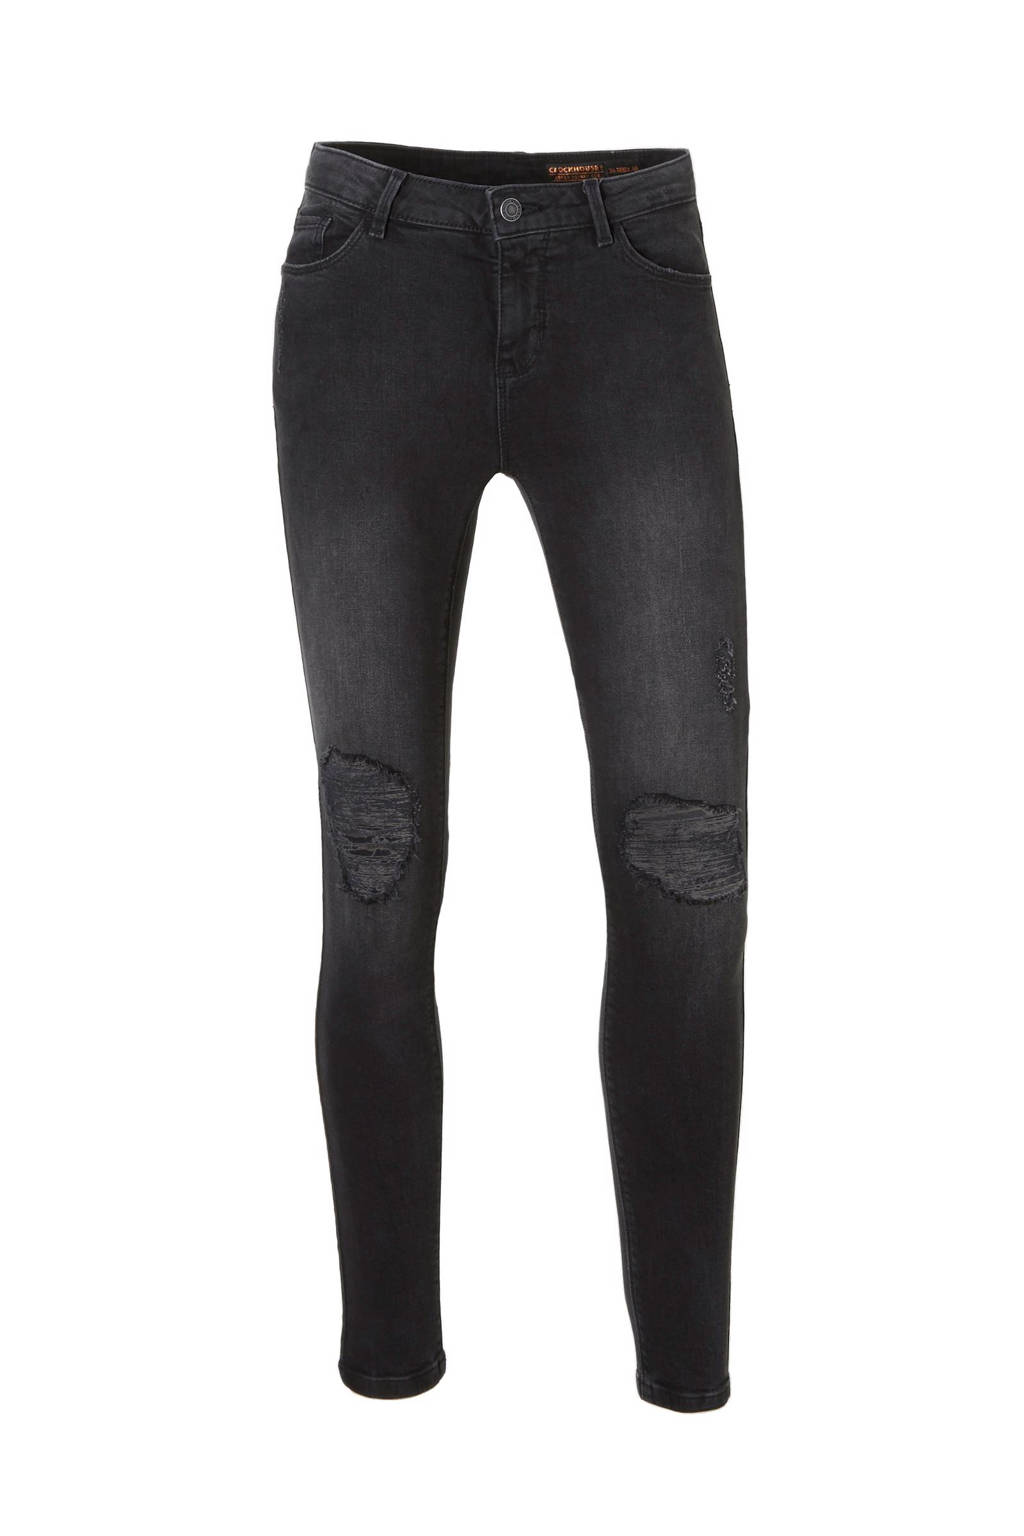 C&A Clockhouse super skinny fit jeans, Zwart